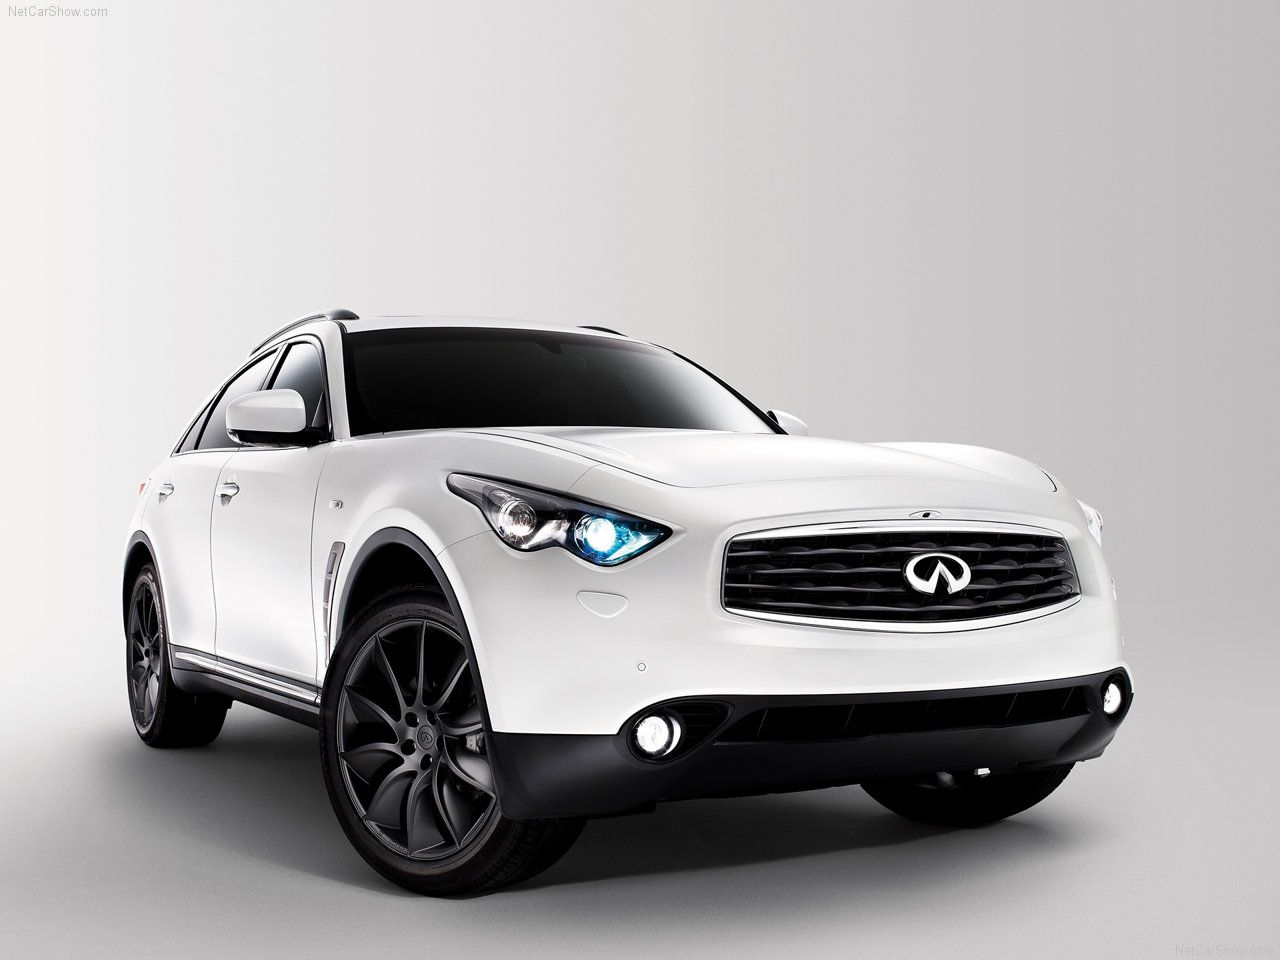 New 2017 infiniti qx70 redesign http newestsportscars com new 2017 infiniti qx70 redesign cars release date pinterest luxury cars